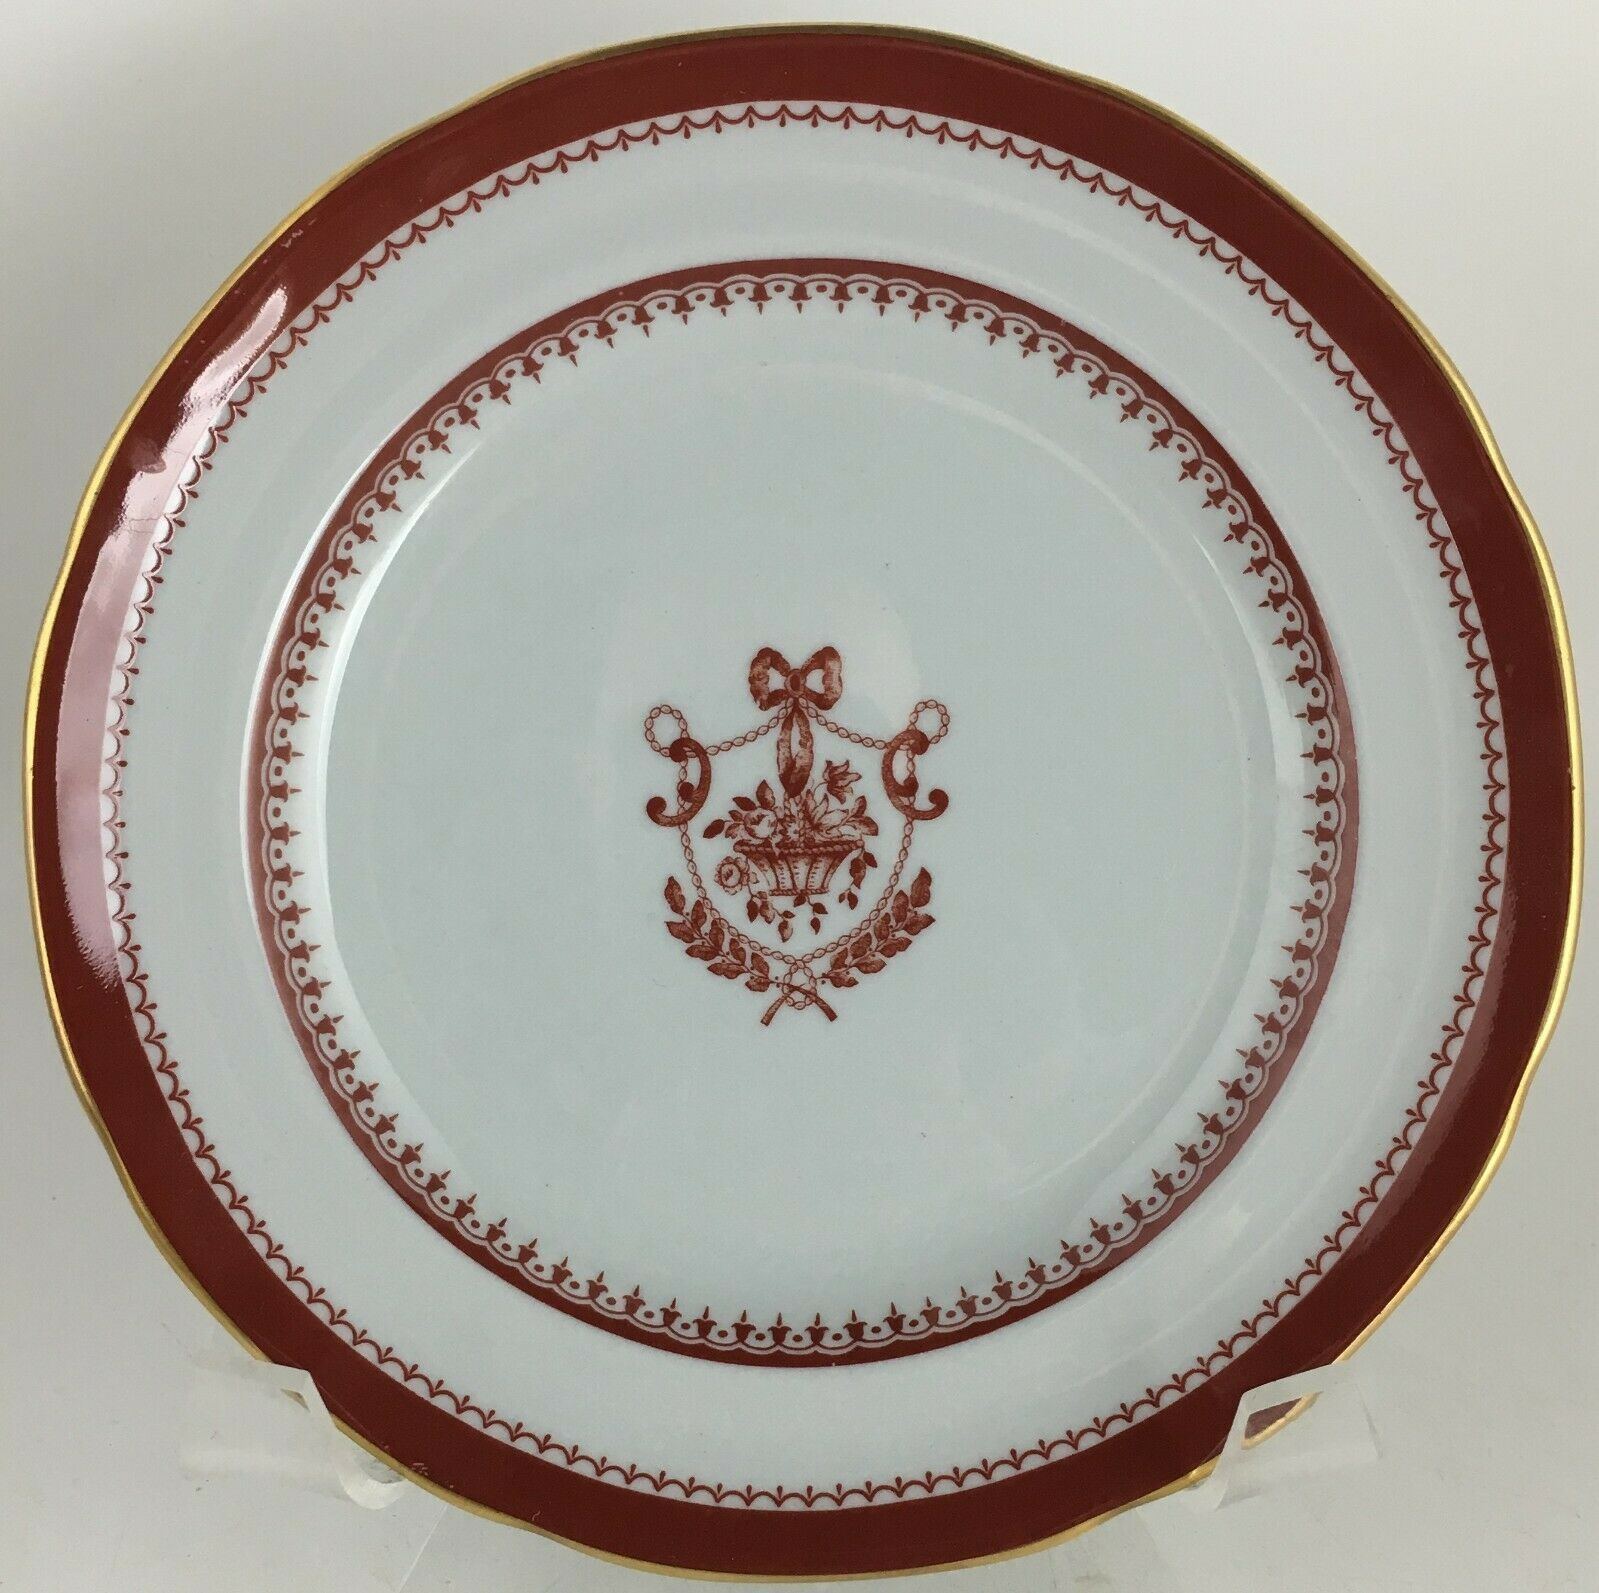 Spode Newburyport Y3360 Red Bread & butter plate - $10.00